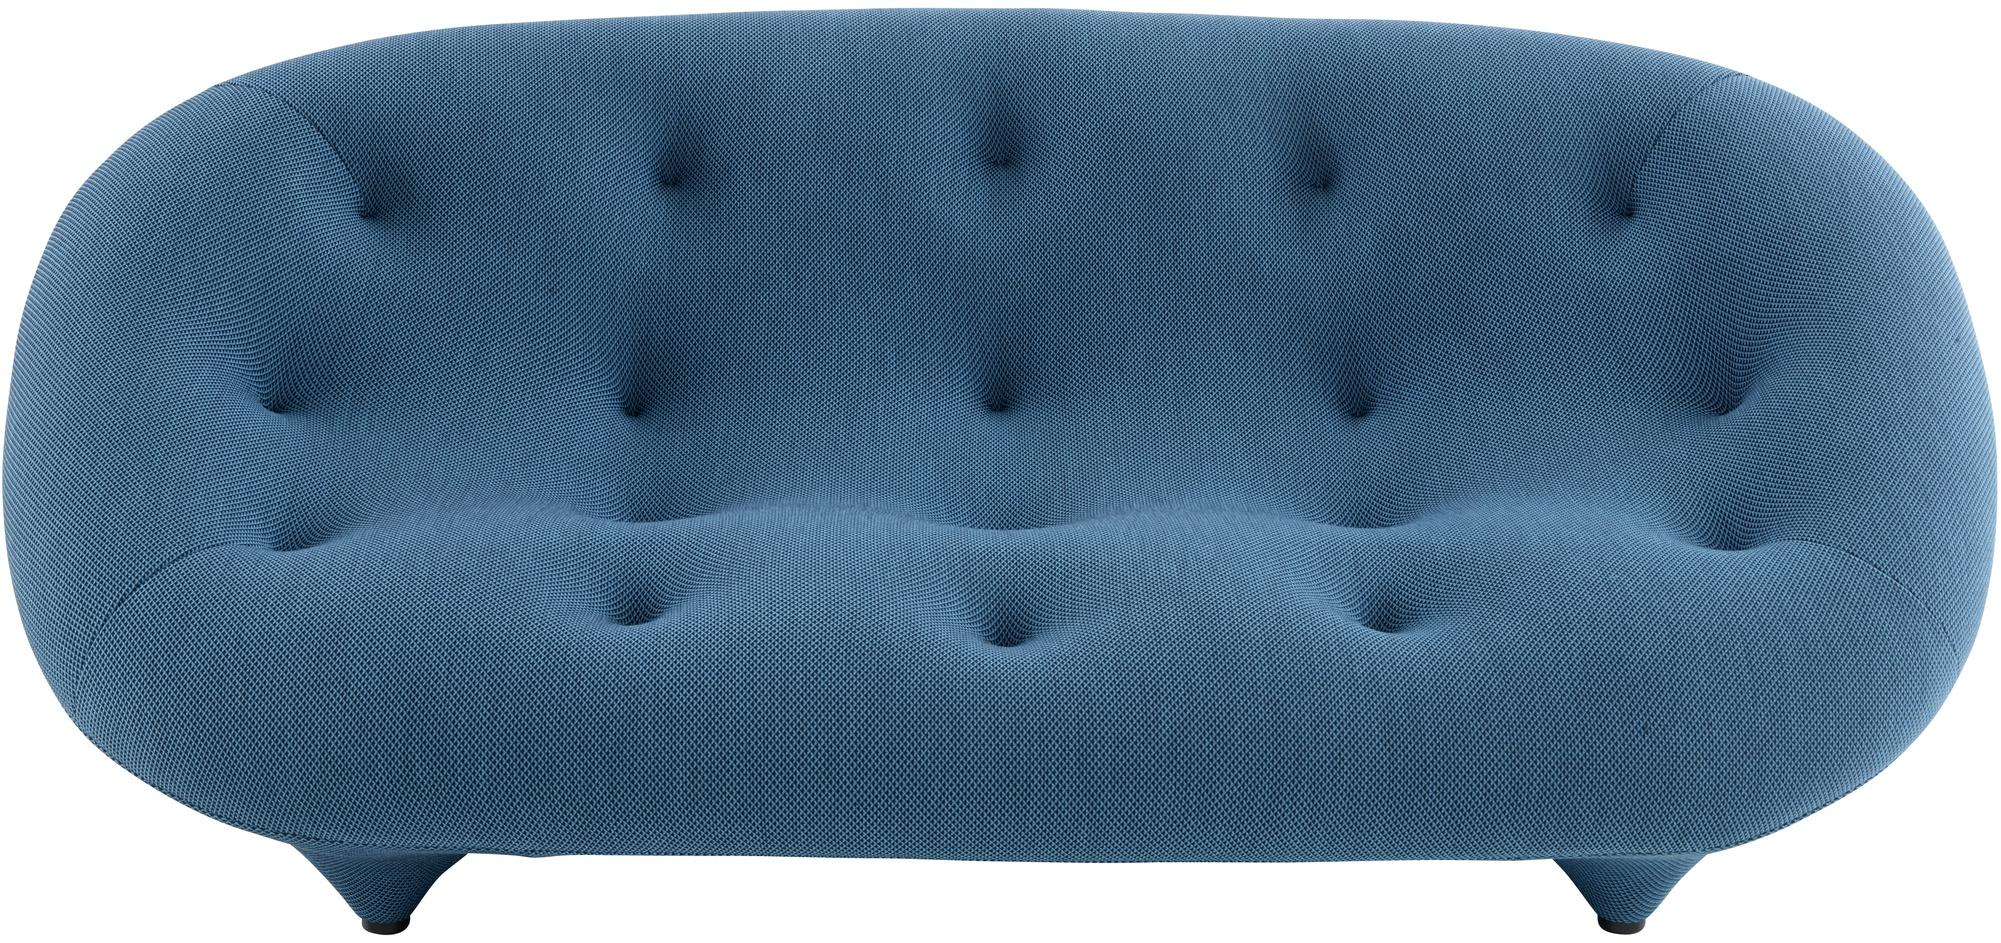 ploum, sofas designer : r. & e. bouroullec | ligne roset, Wohnzimmer dekoo